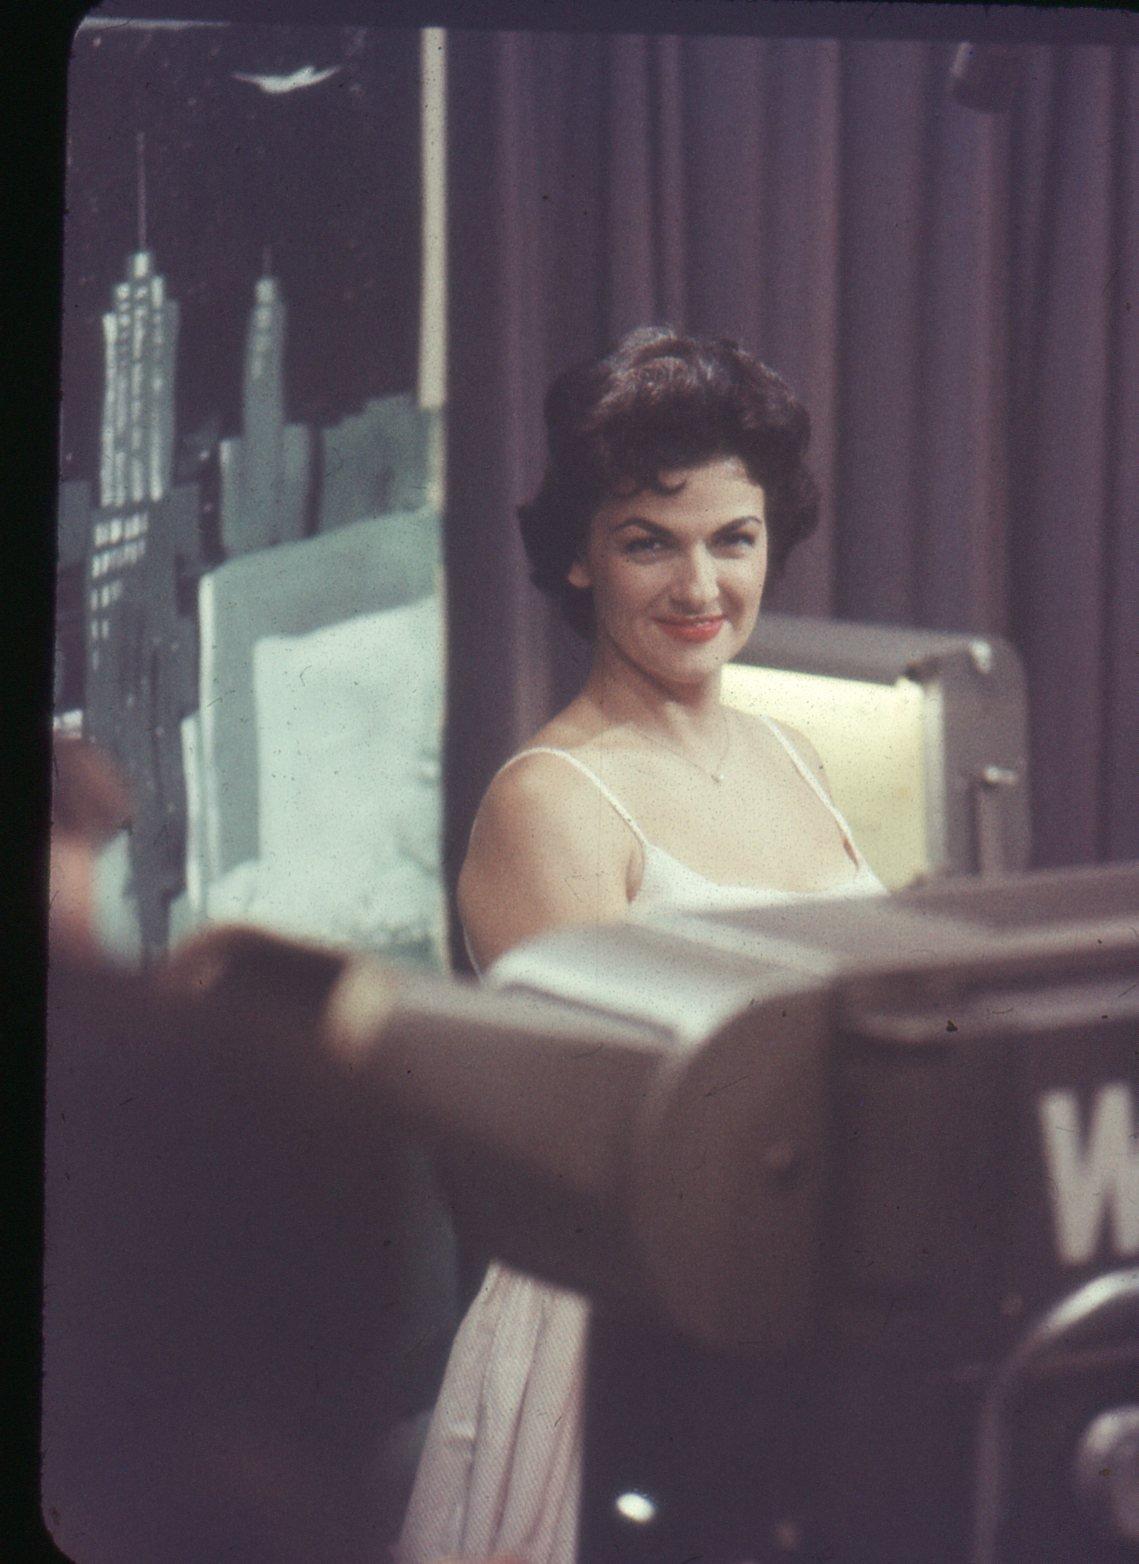 Behind the Scenes at Memphis' WREC-TV Studio in the 1950s